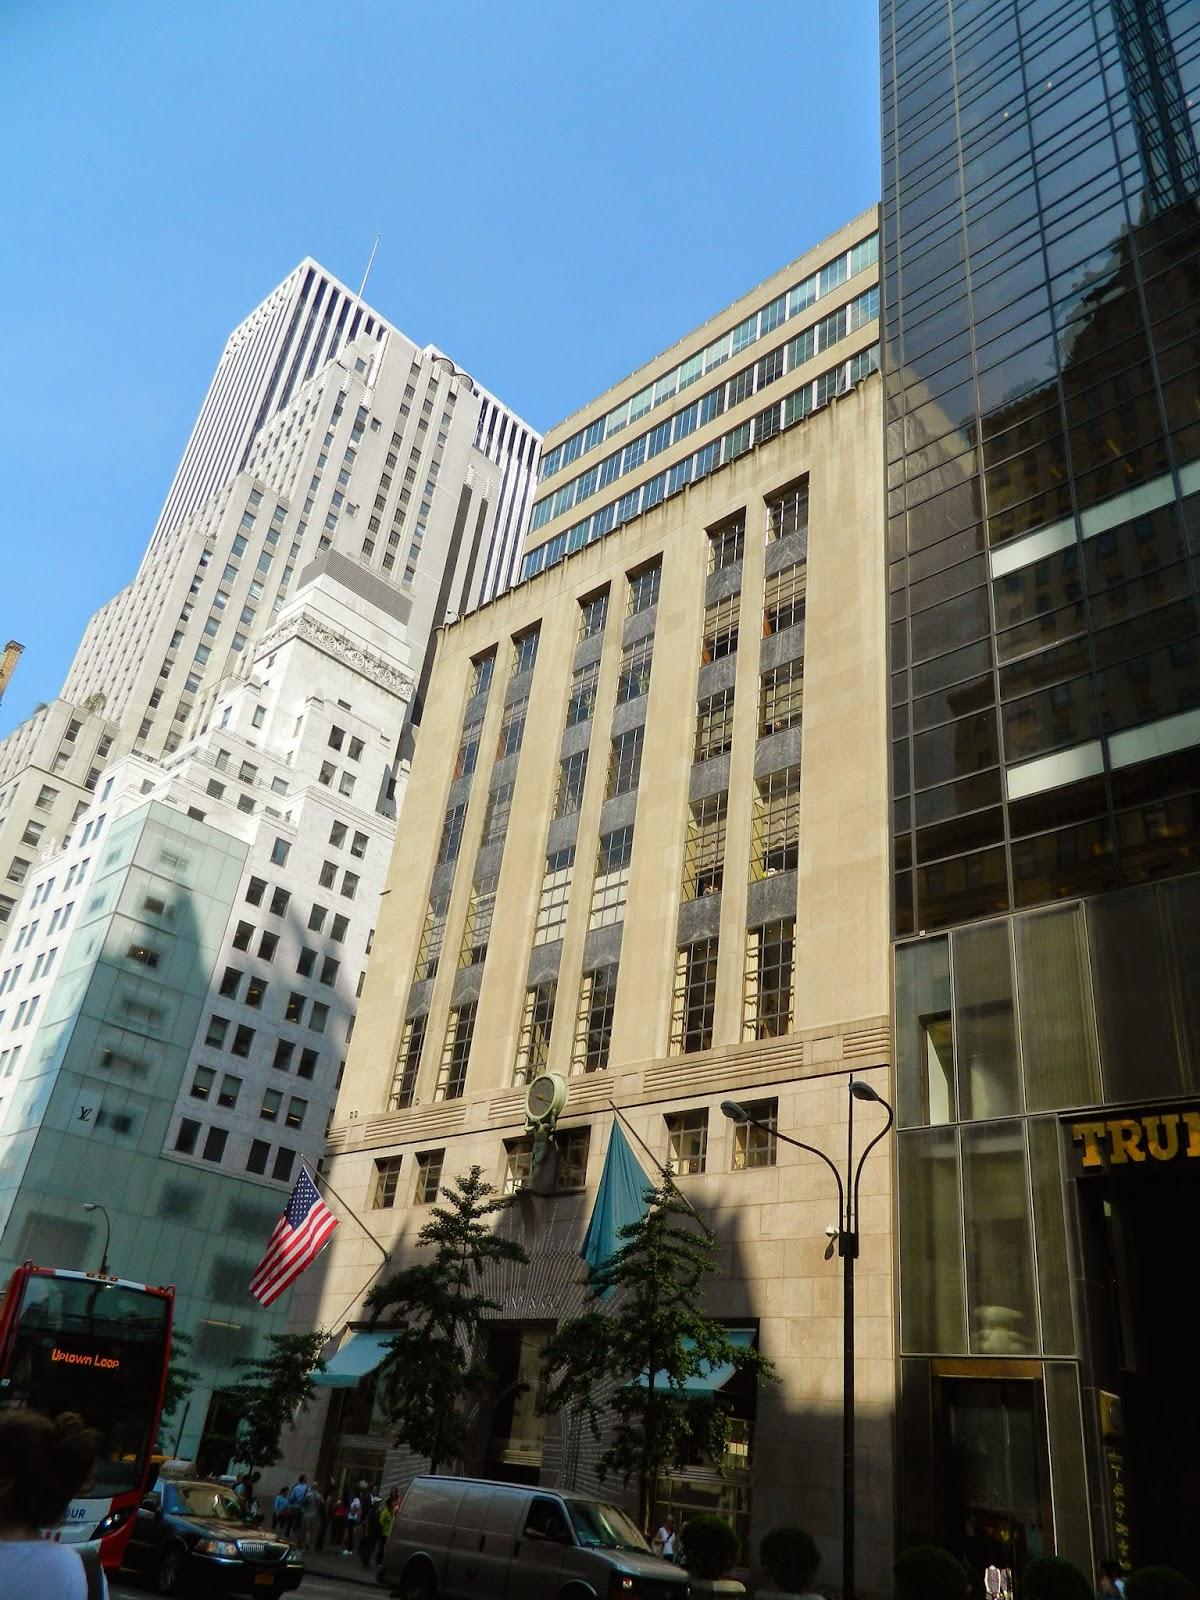 New York Day Five: 5th Avenue